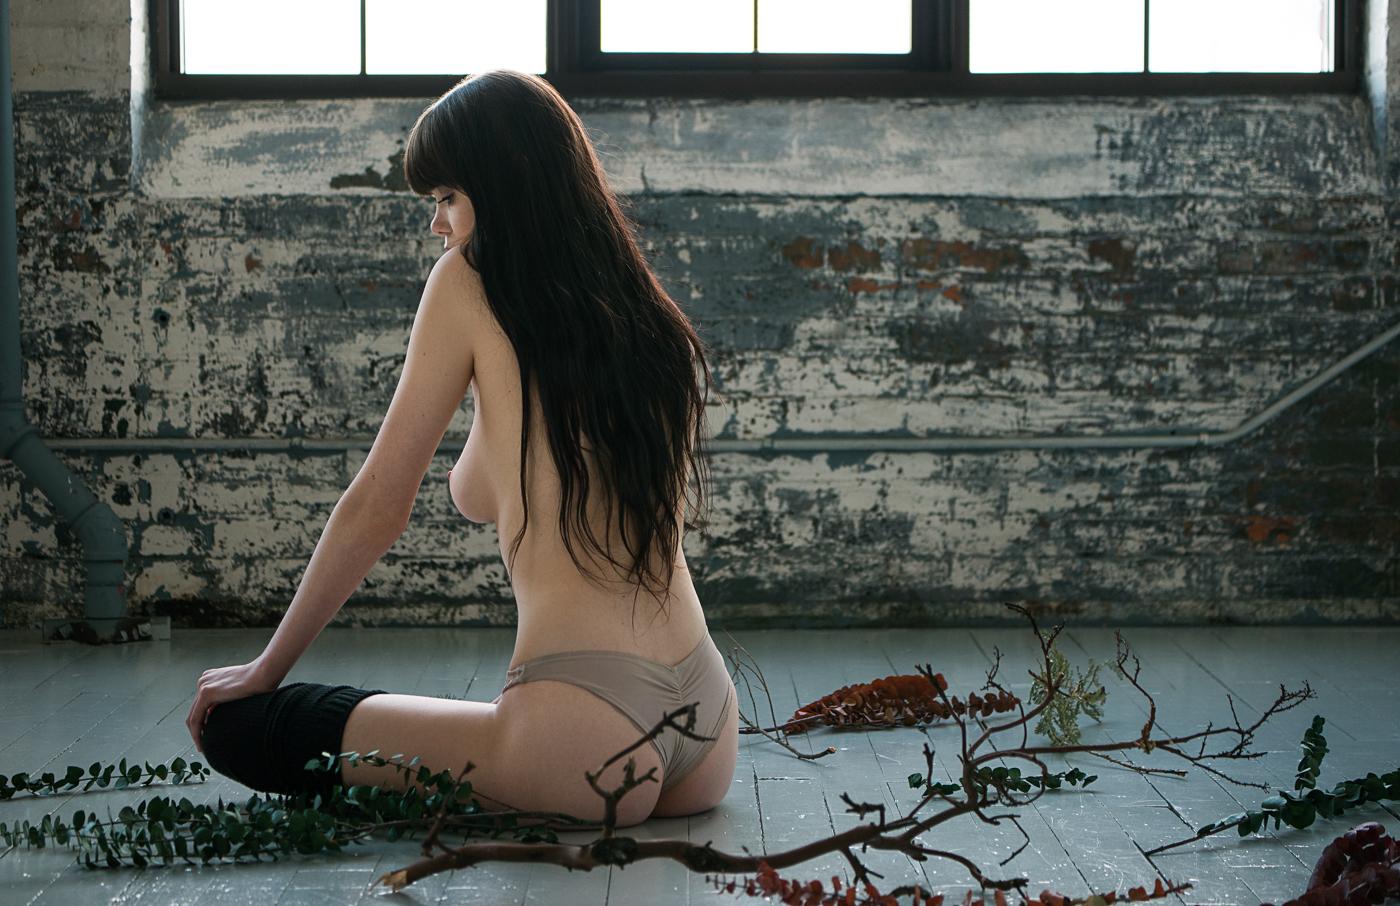 Ireland Rose Nude Art Model Photographed By Mark C Hanson-5366